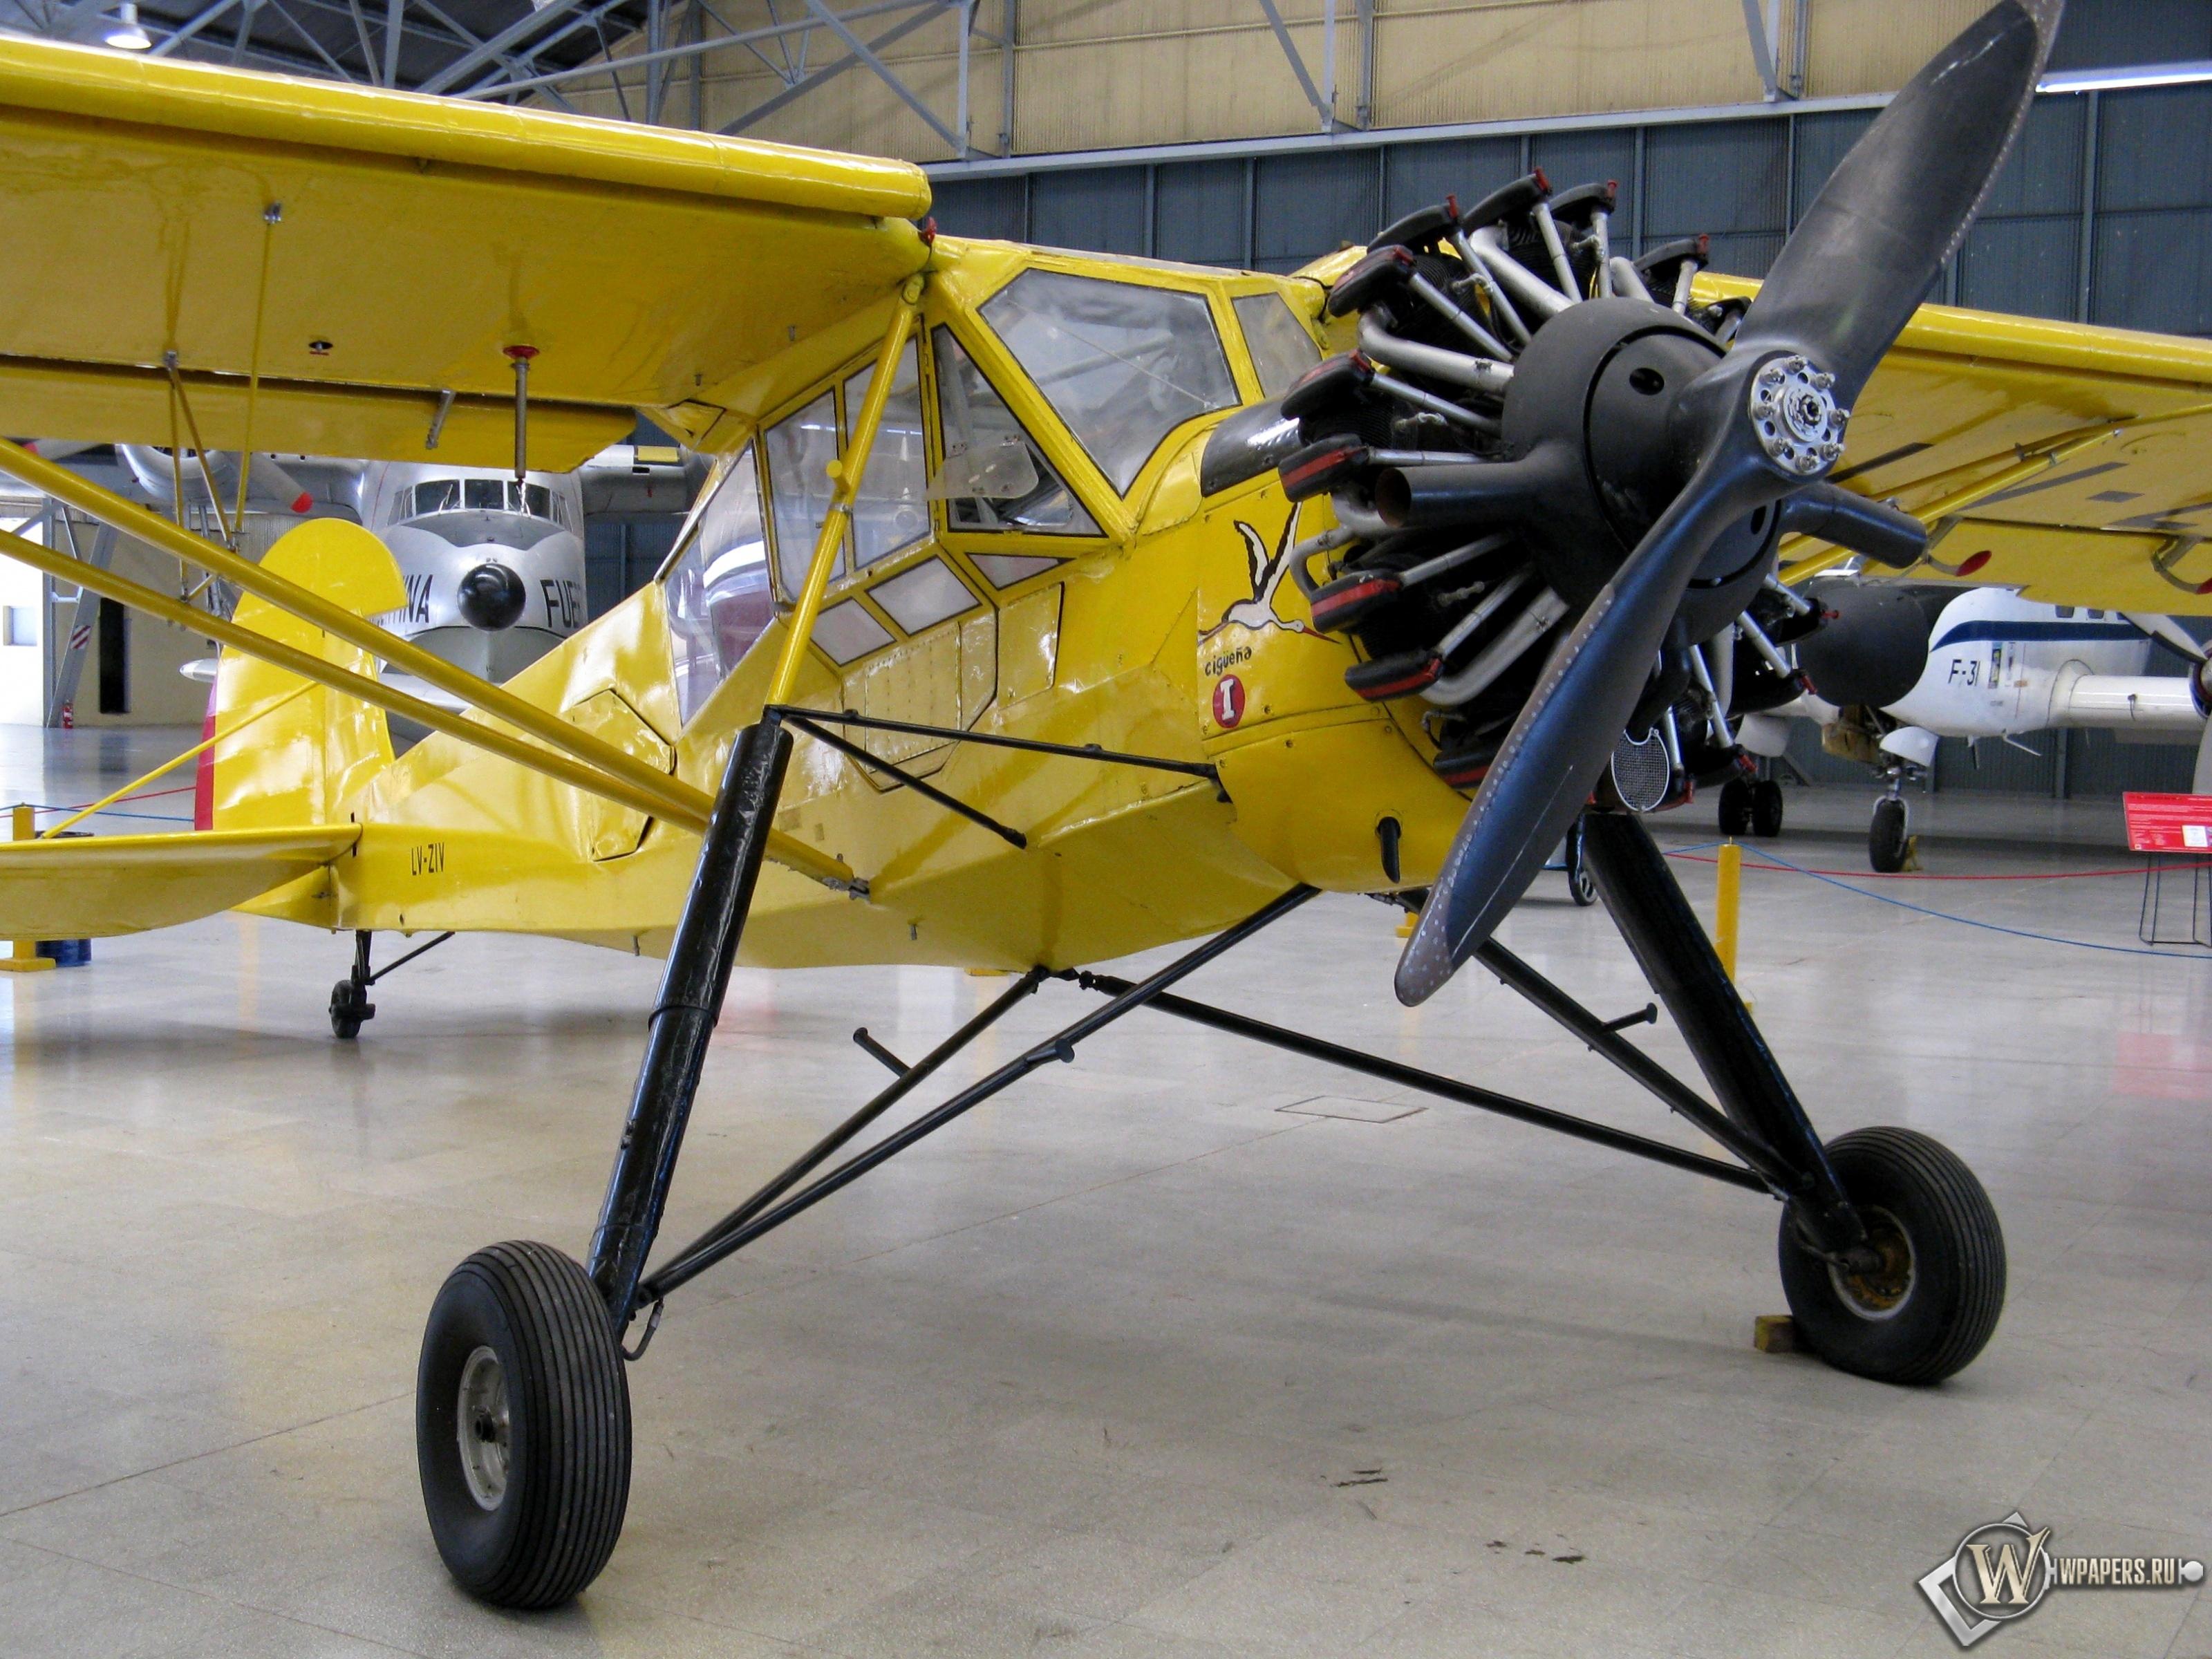 Fieseler Storch Fi-156 3200x2400